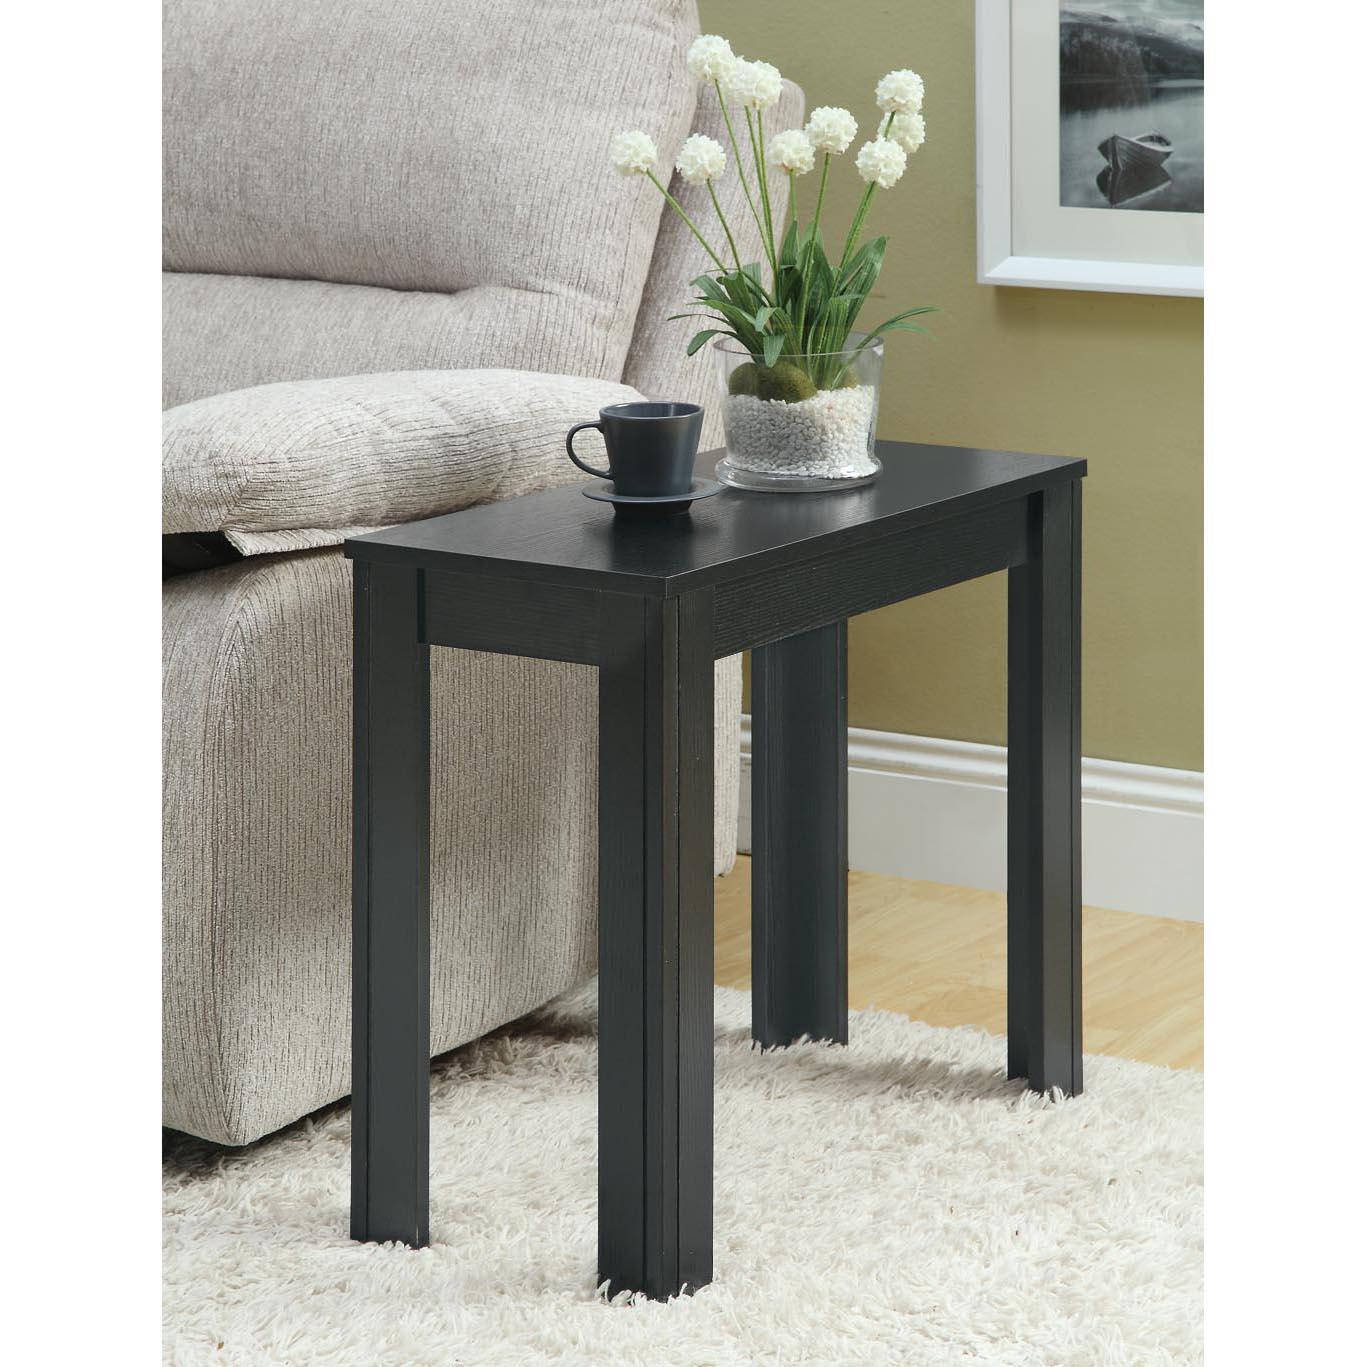 Black oak accent side table 14344316 for Furniture of america architectural inspired dark espresso coffee table